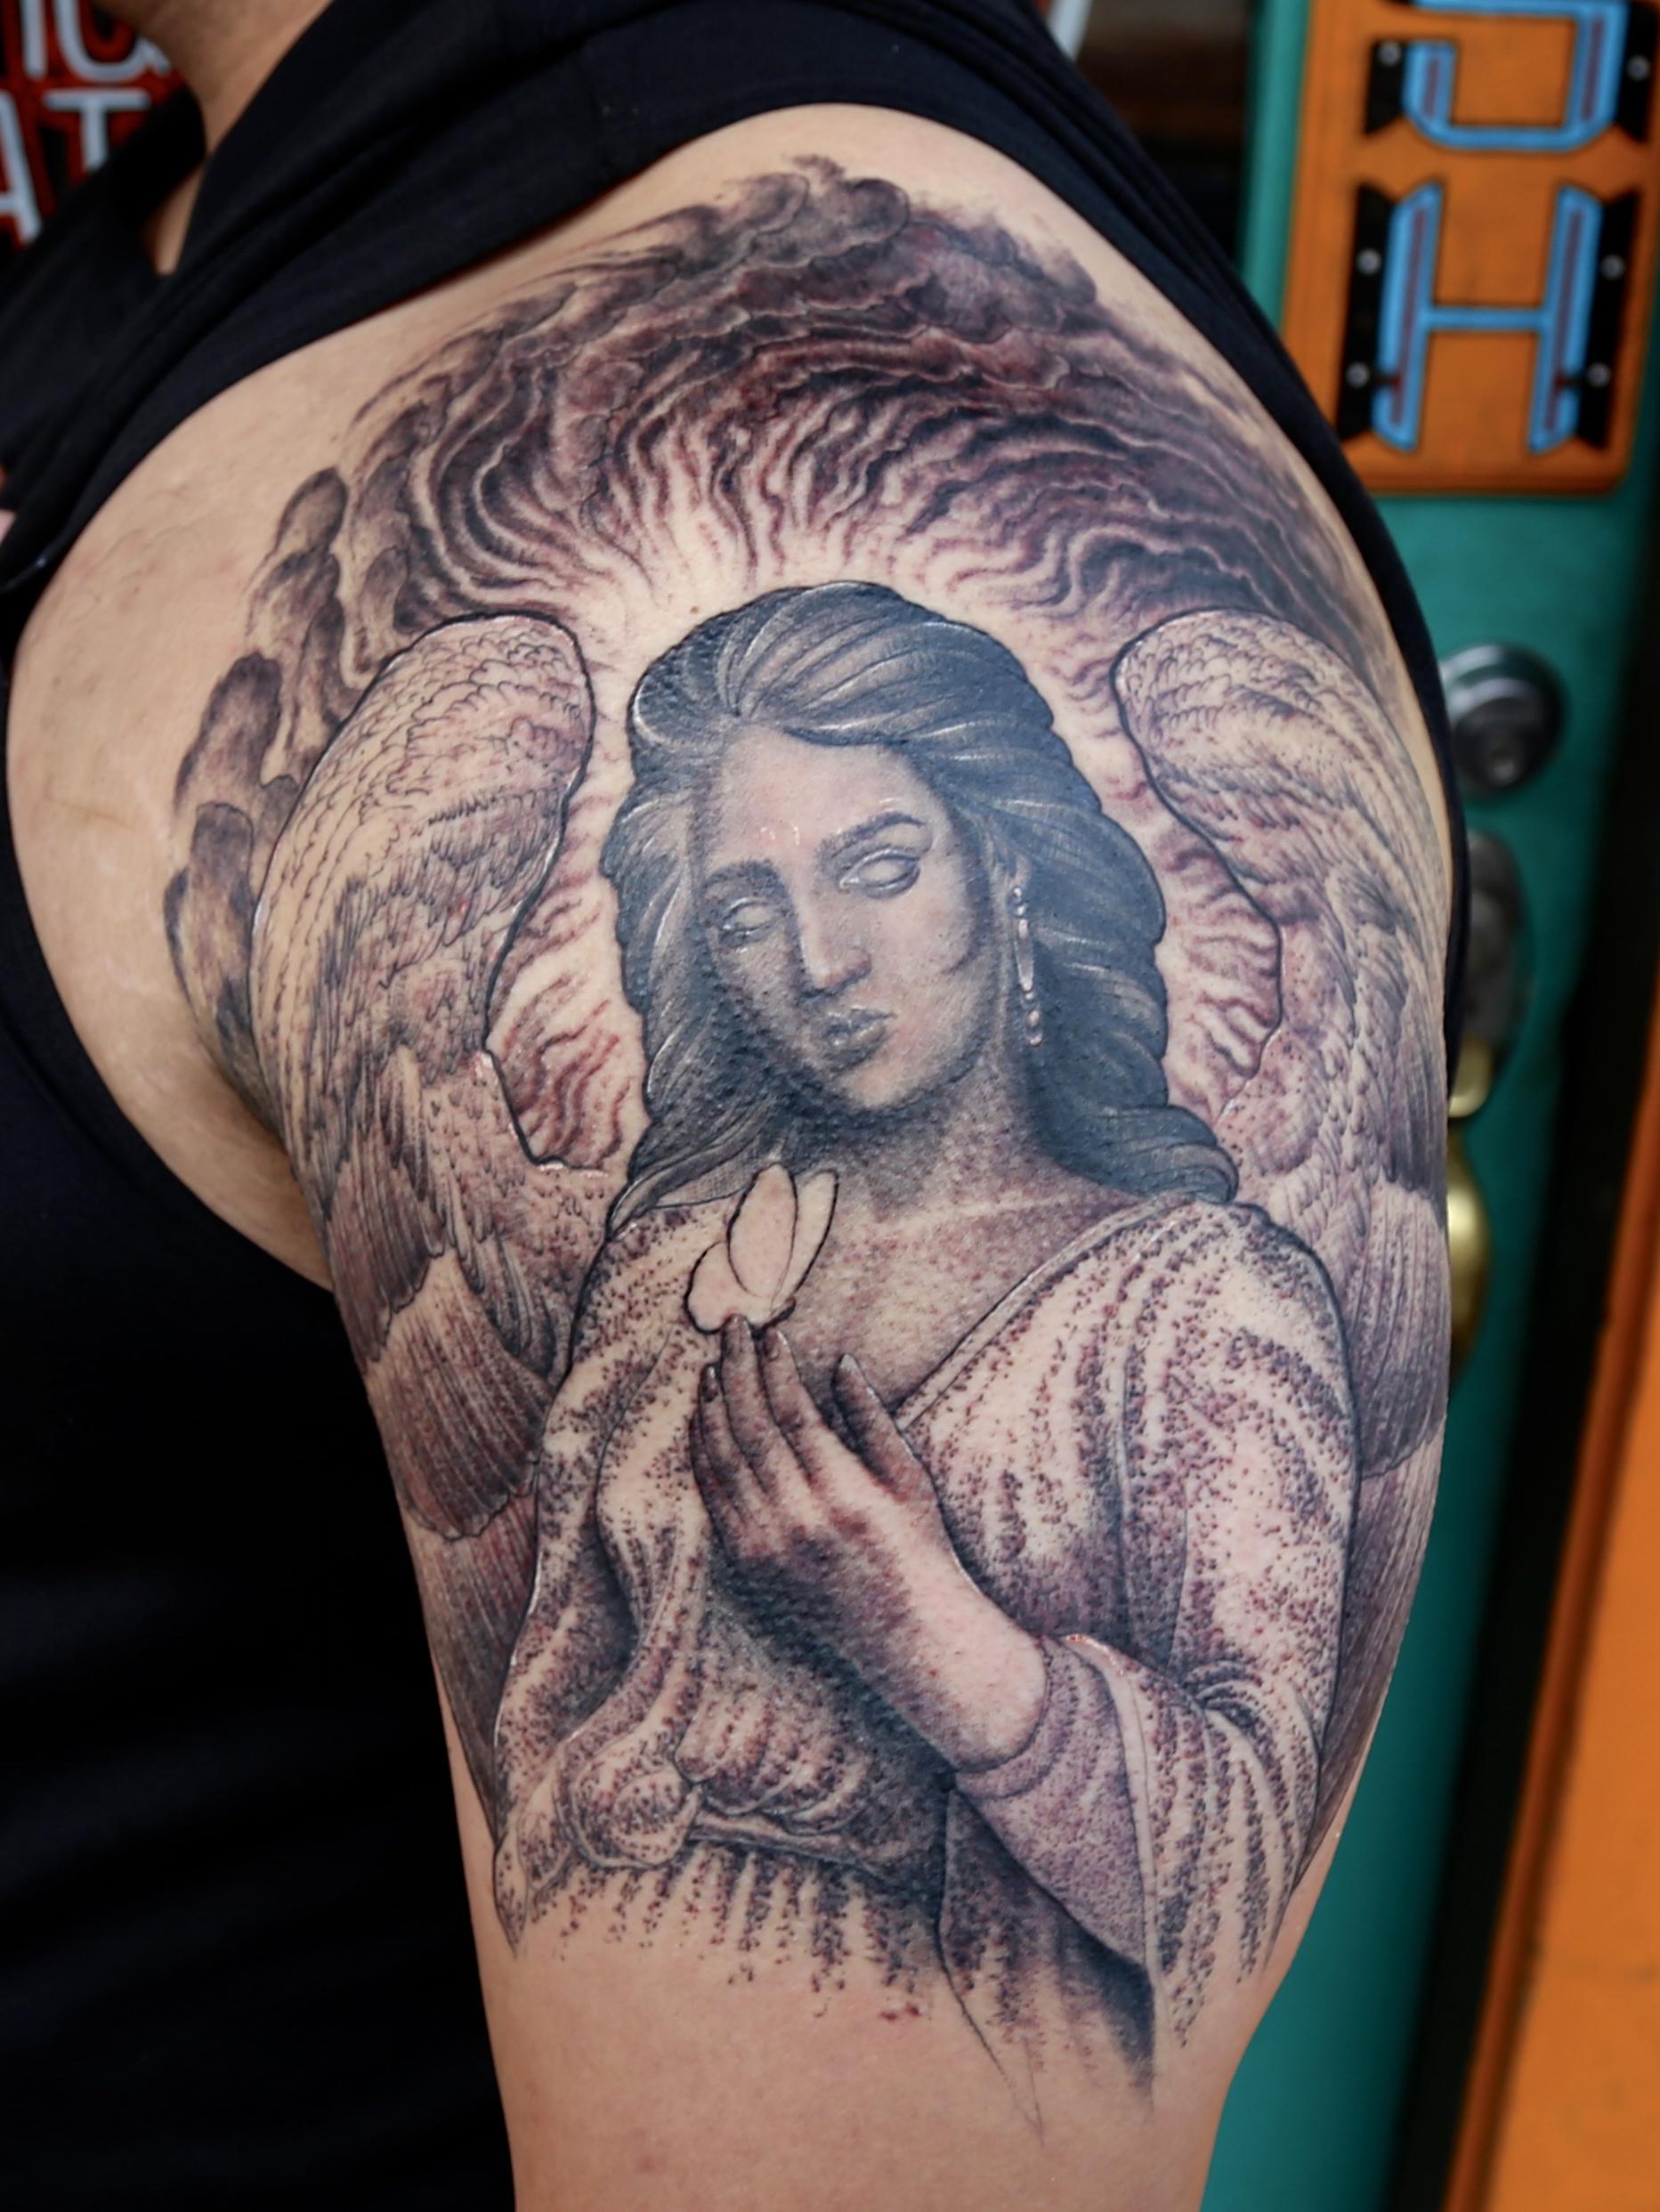 Angel enrique bernal ejay tattoo.JPG